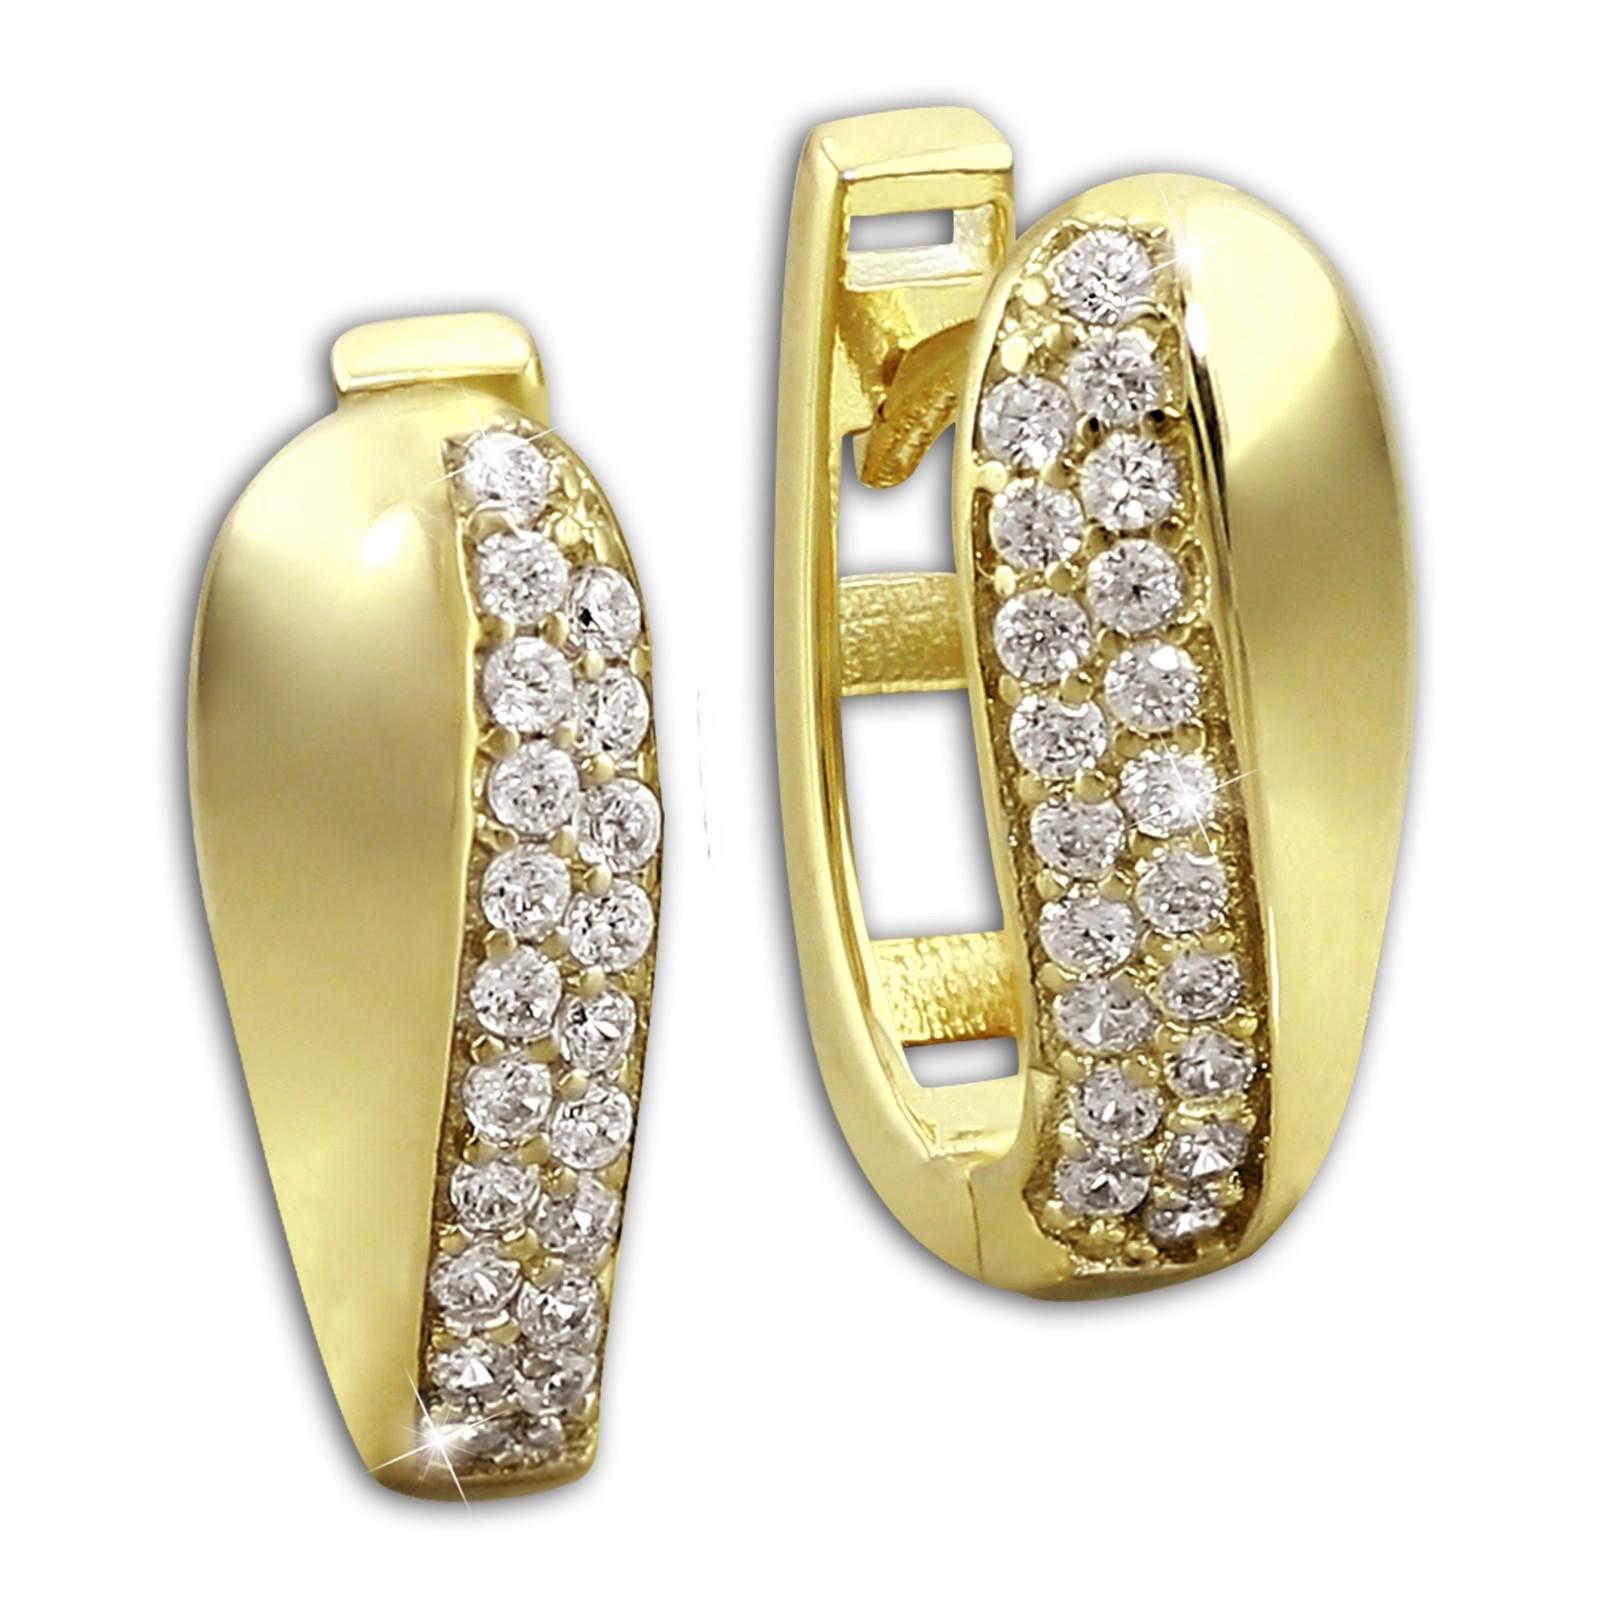 SilberDream Creole Glamour Zirkonia weiß Ohrring 333 Gold Echtschmuck GDO526WY